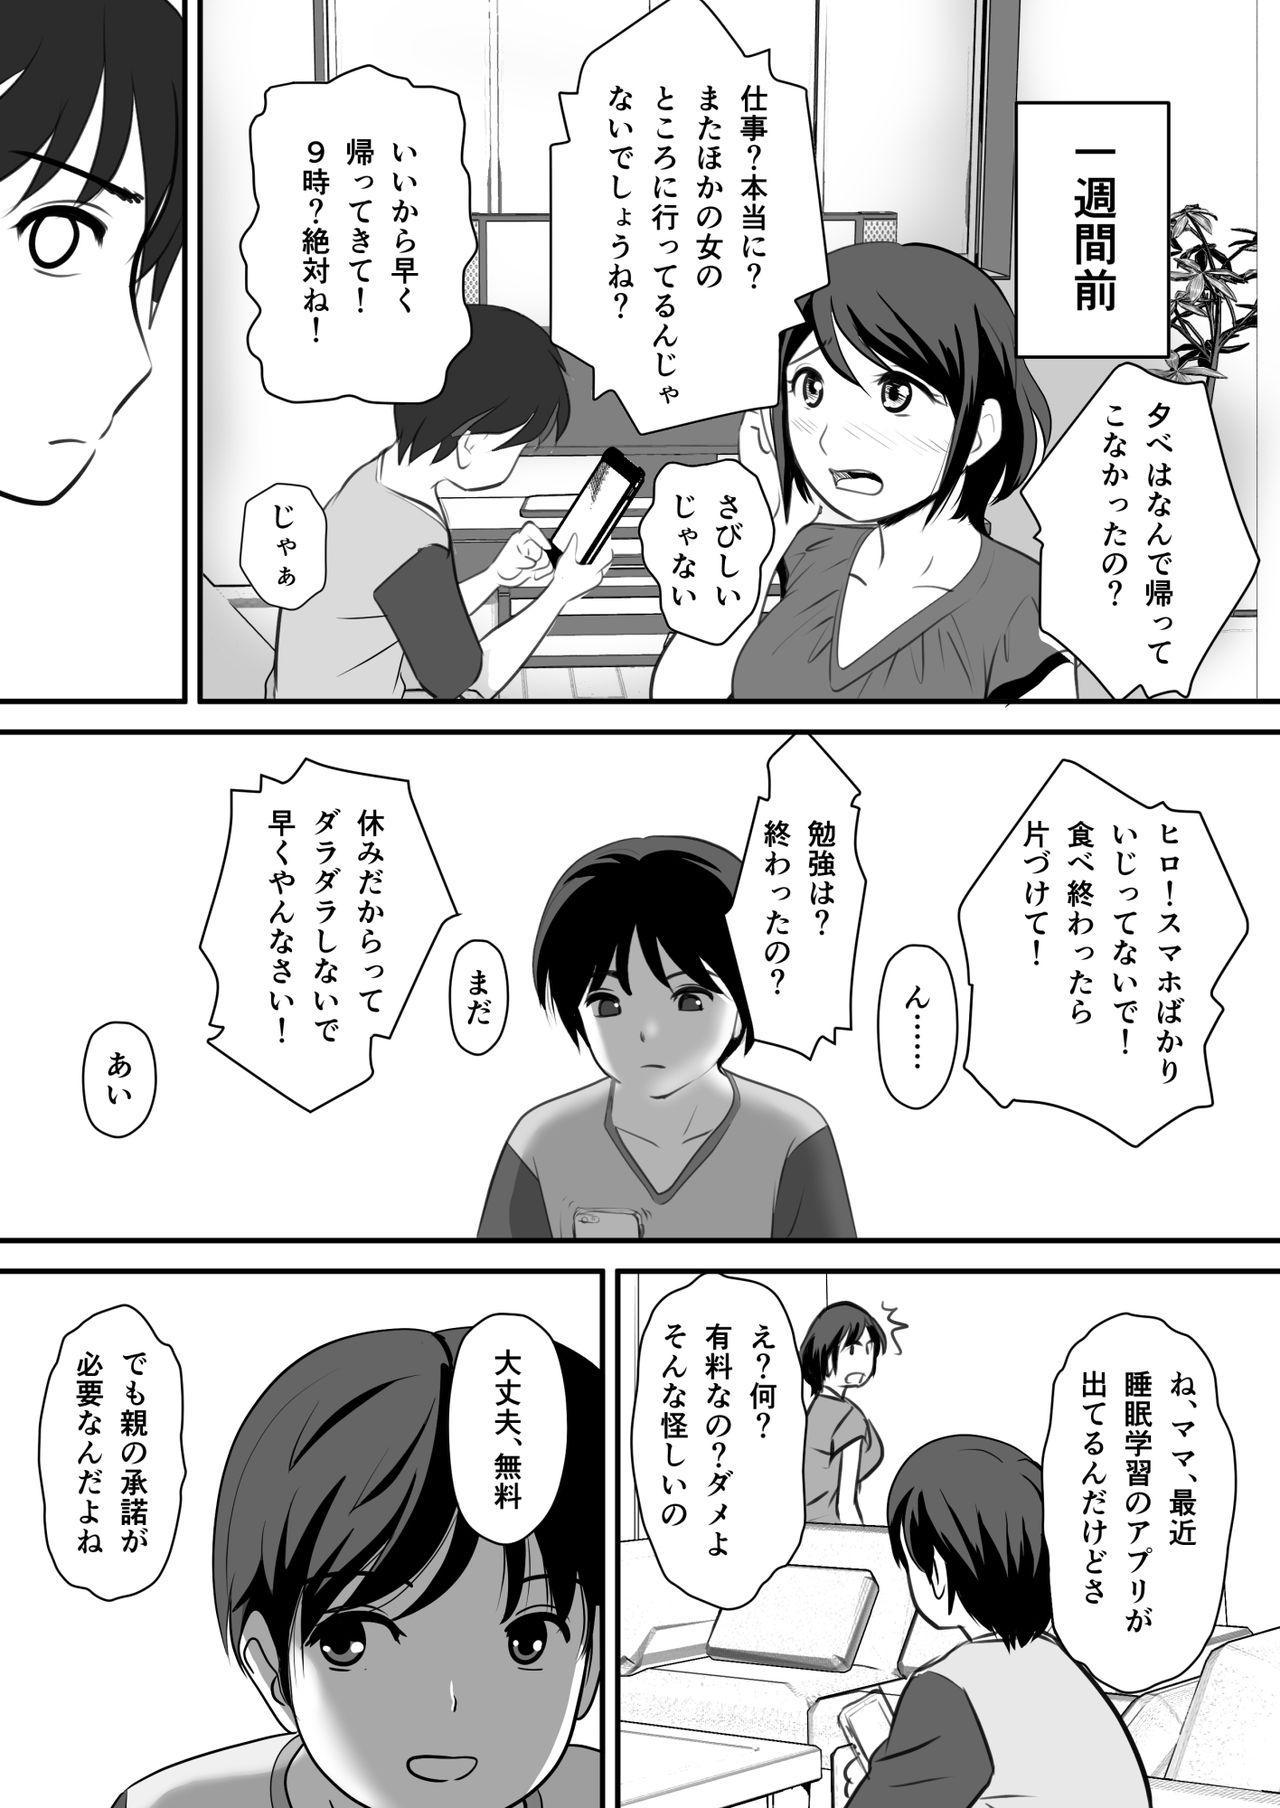 [Milky Club] Netori Appli -Kuso Oyaji kara Kaa-san o Netotta ken- 10